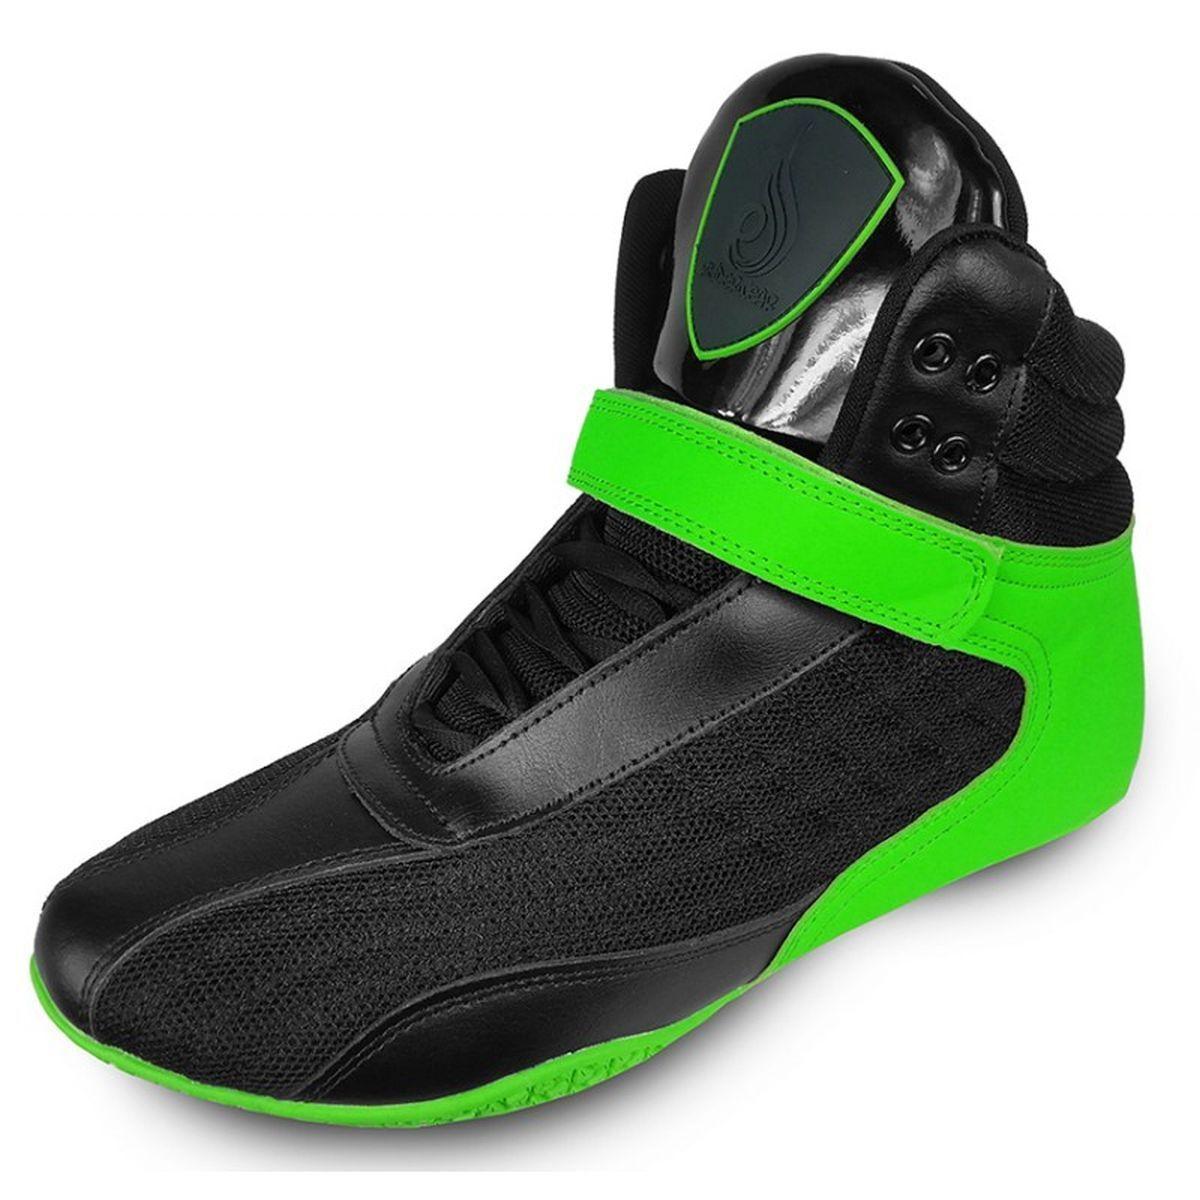 Ryderwear Raptors G-Force Performance scarpe- nero   verde- New New New 8abb0c